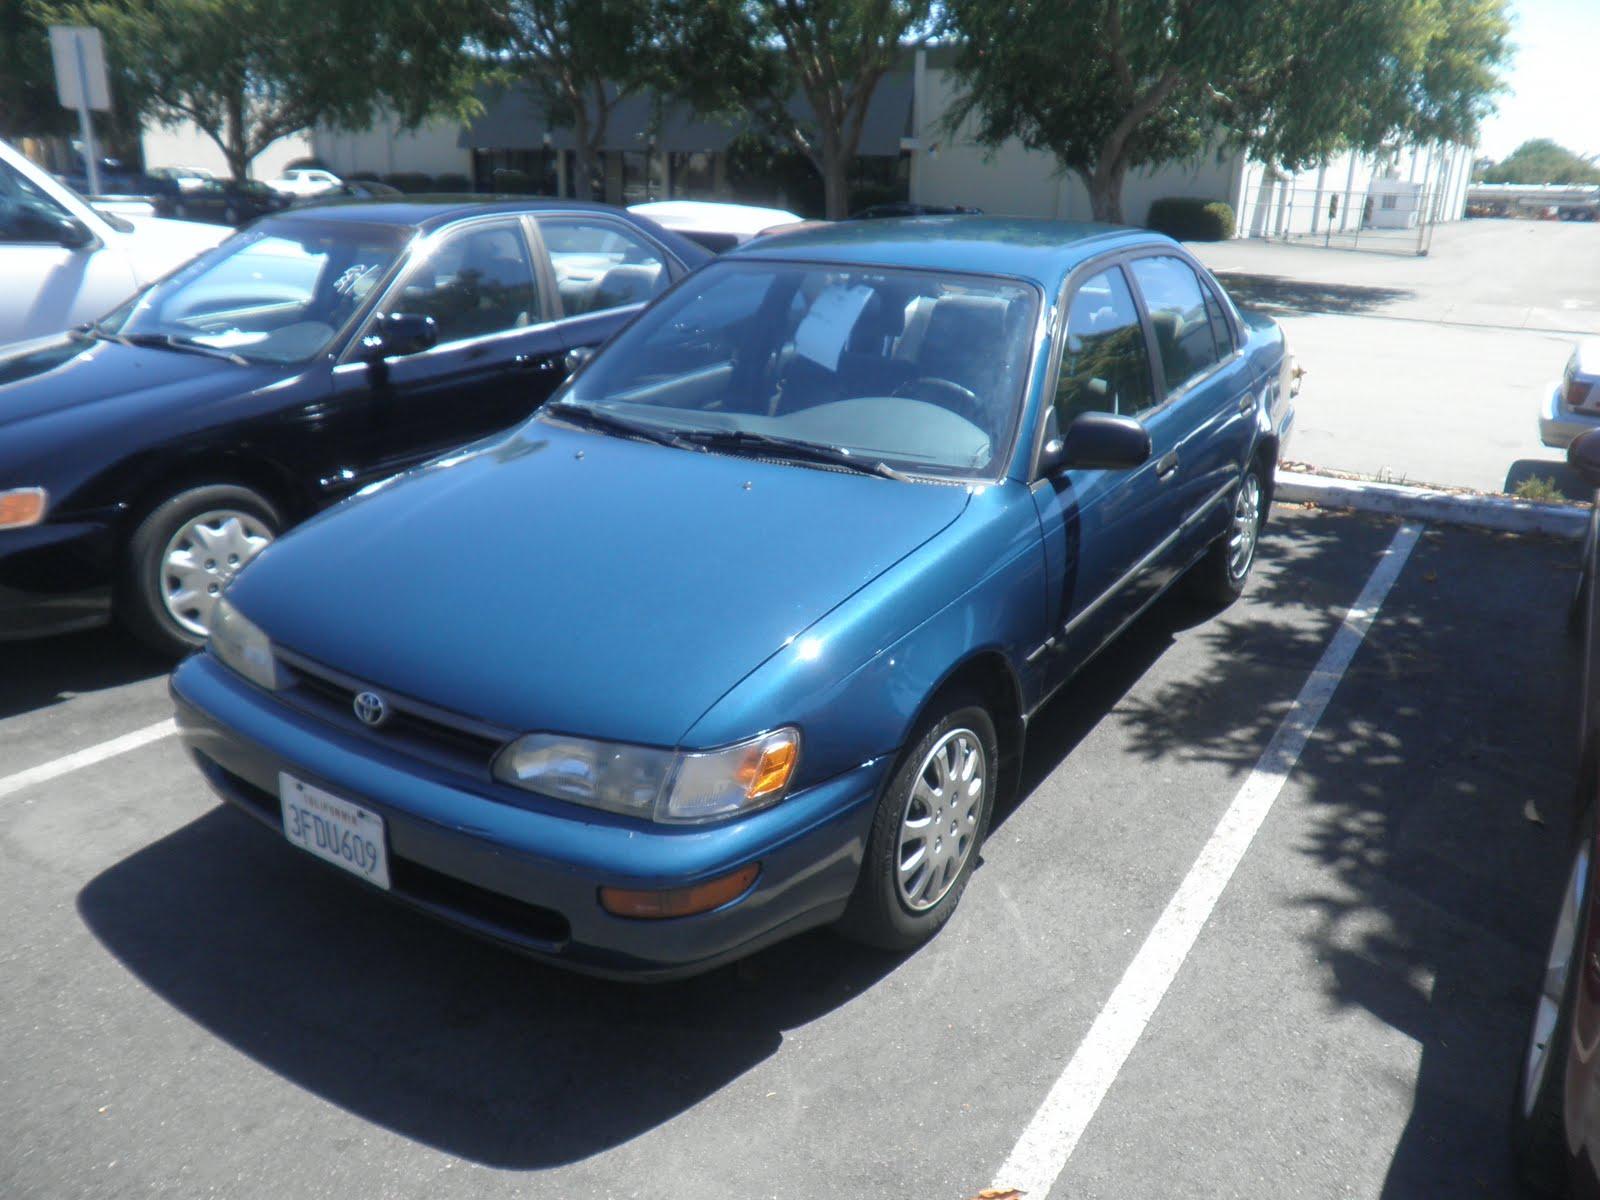 Fremont Toyota Service >> Auto Body-Collision Repair-Car Paint in Fremont-Hayward-Union City-San Francisco Bay: 1993 ...